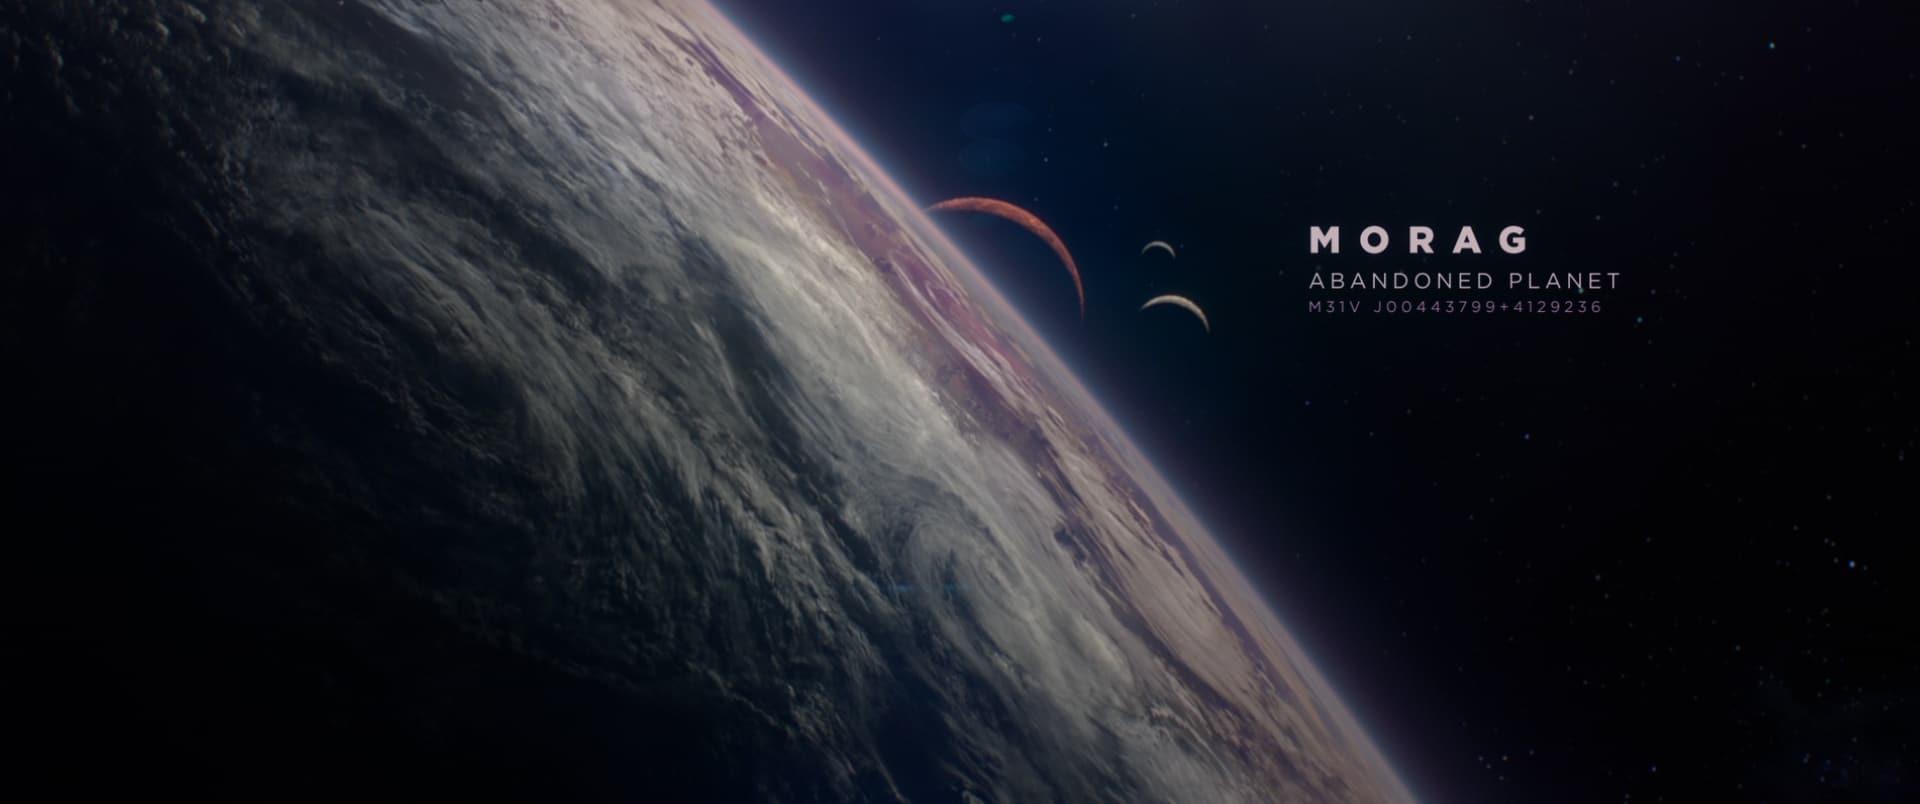 Wide Angle Shot - Camera Movements and Angles- Guardians of the Galaxy - Morag